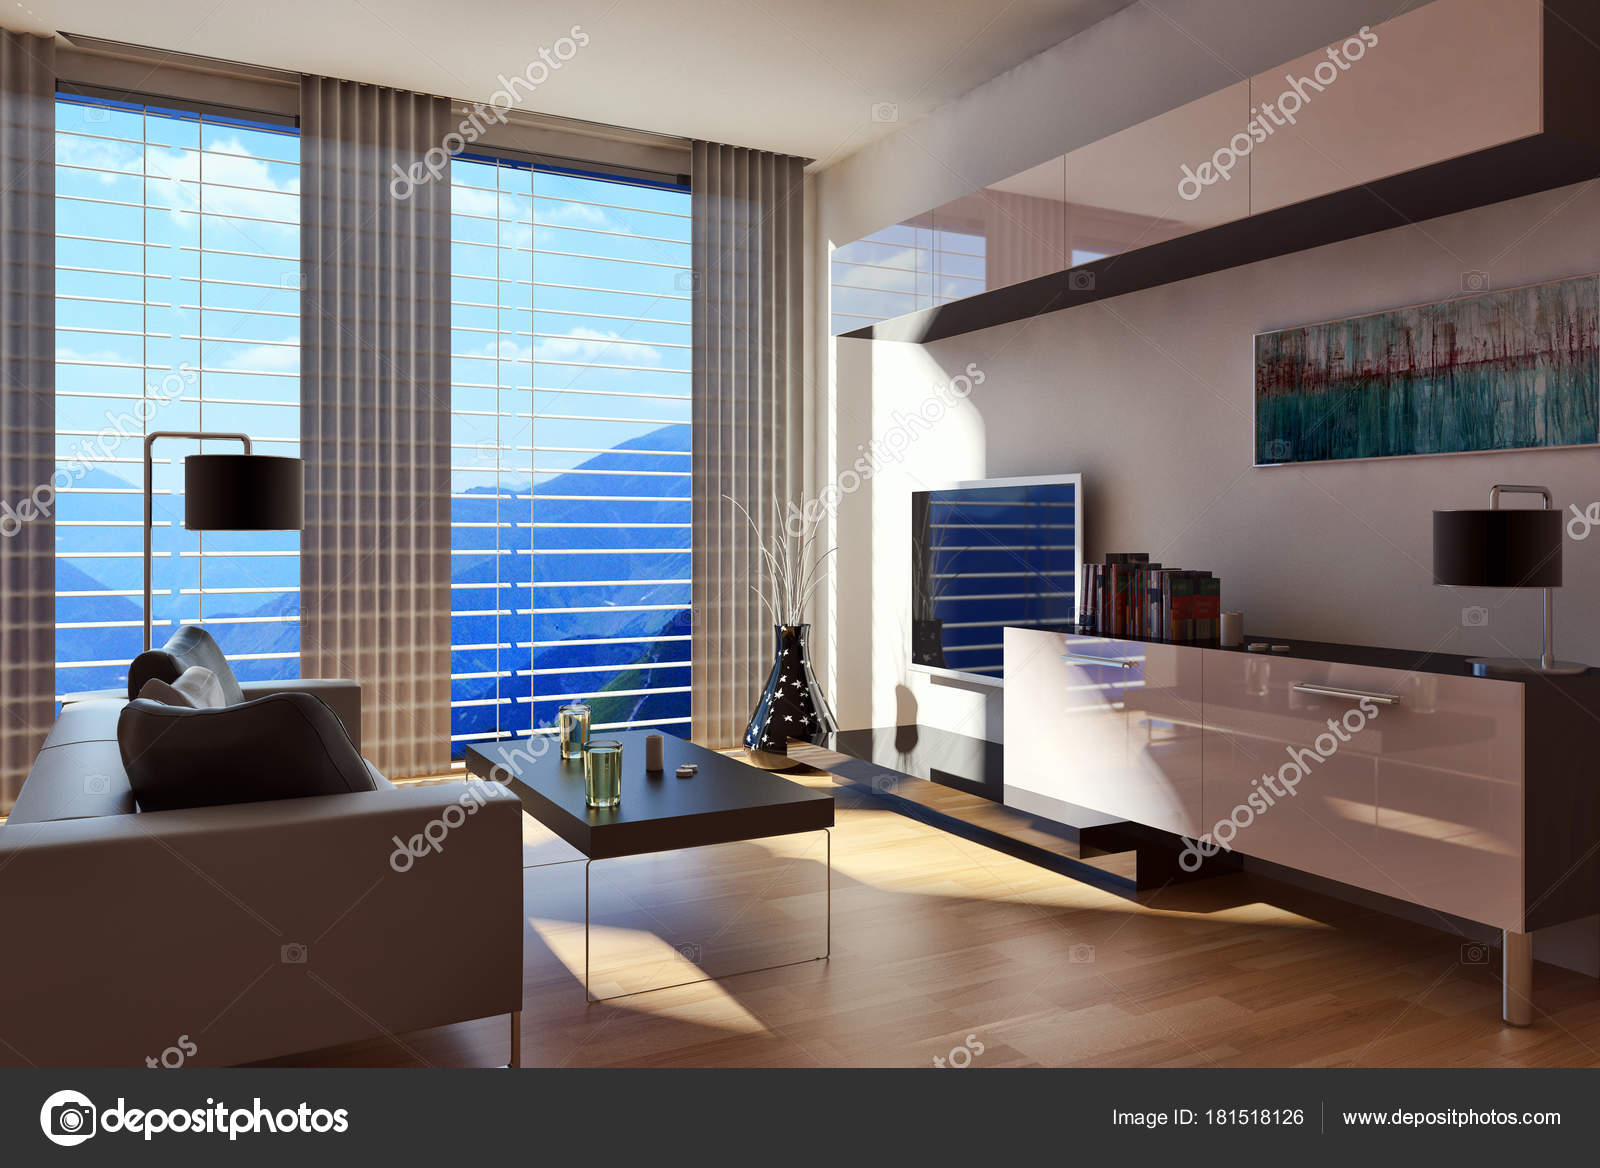 https://st3.depositphotos.com/15869754/18151/i/1600/depositphotos_181518126-stockafbeelding-moderne-interieurs-3d-rendering-illustratie.jpg